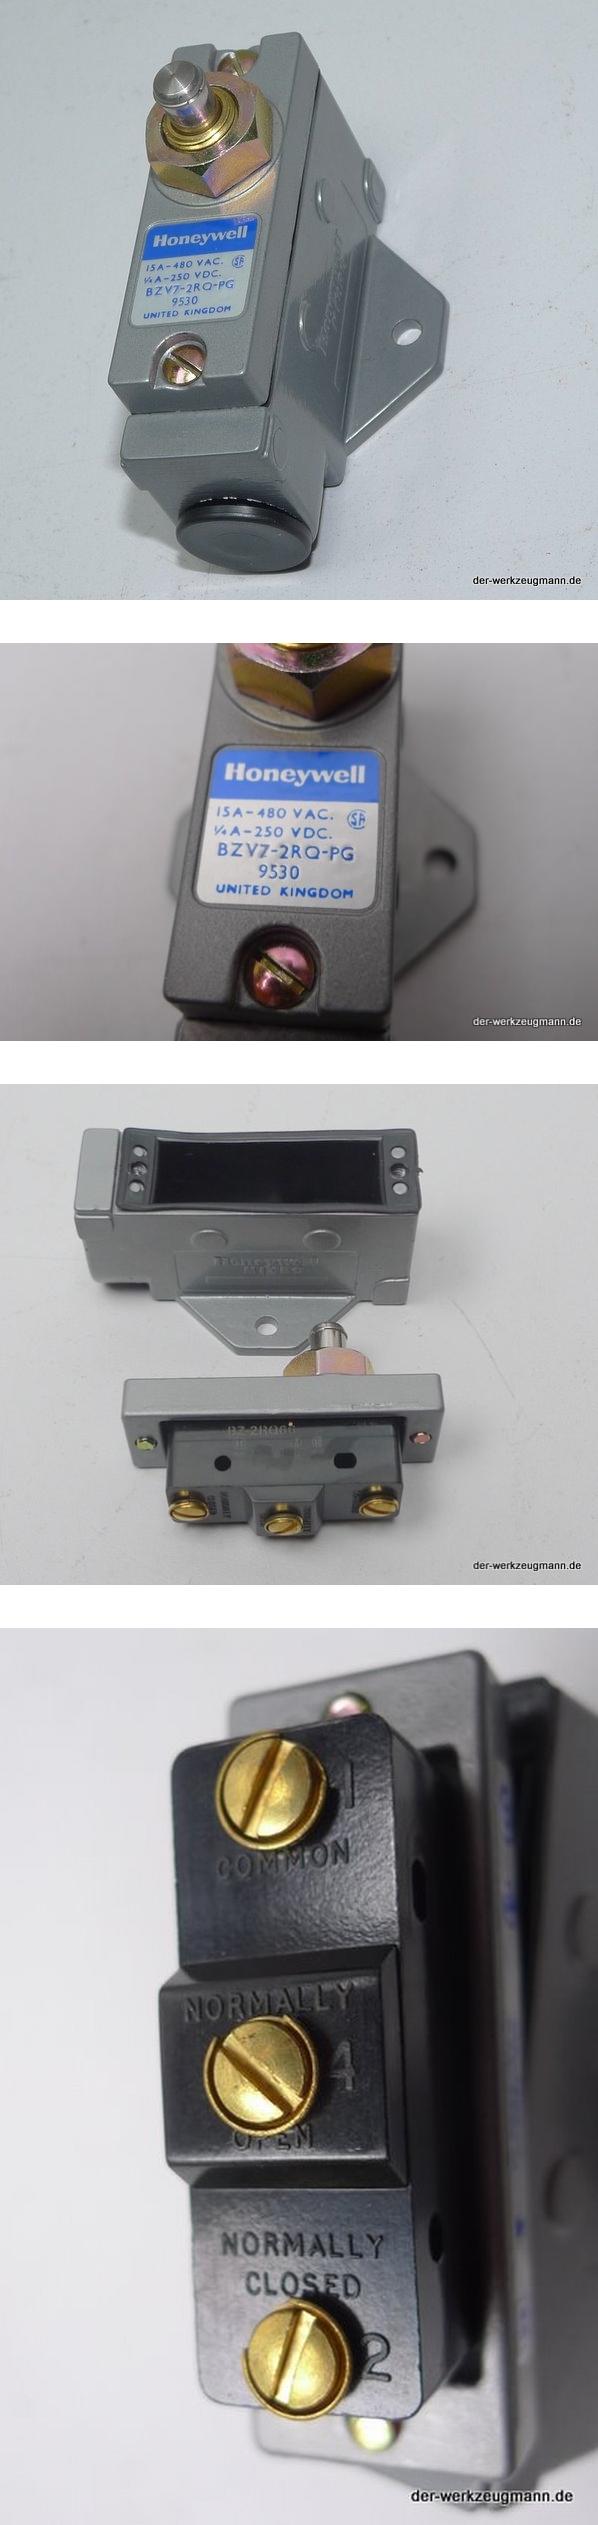 Honeywell Microschalter Endschalter BZV7-2RQ-PG 9530